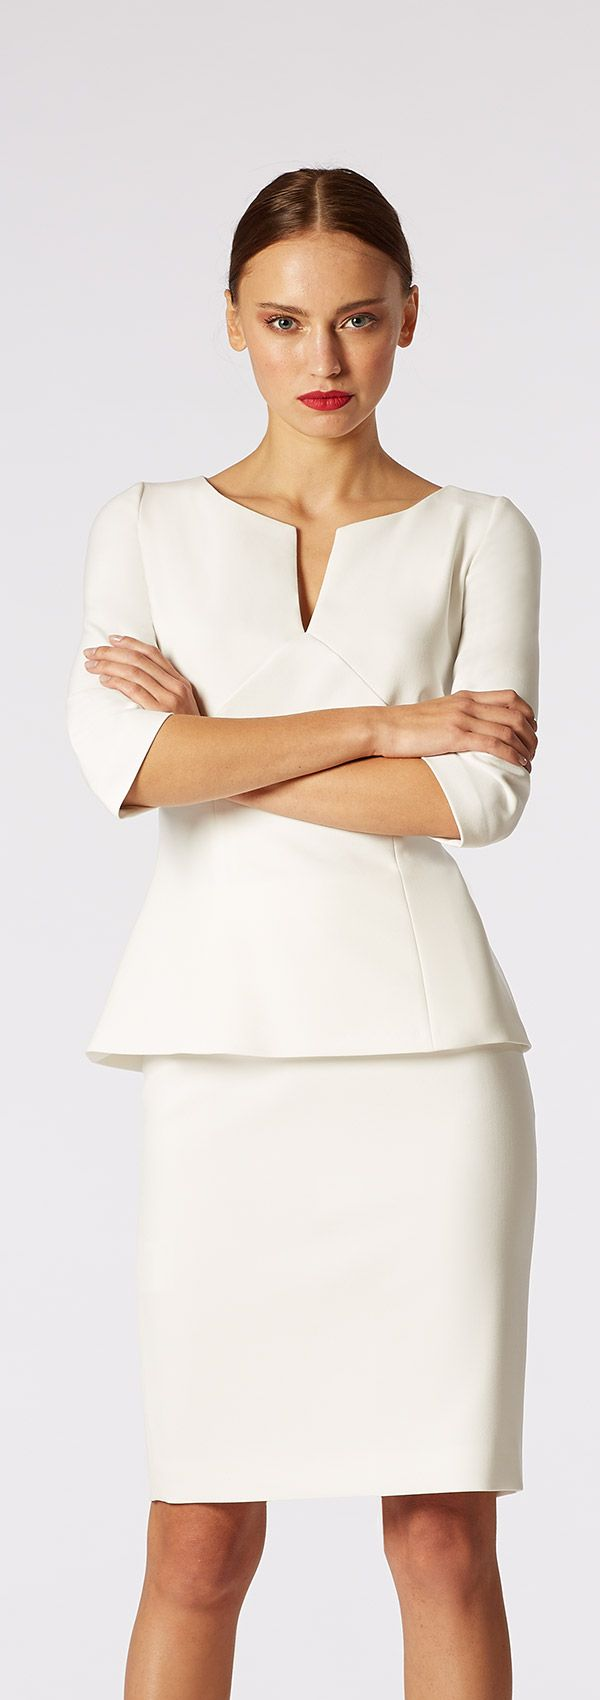 Popular White Women Suits With Black Dress 2013 Summer Work Wear Career Dress